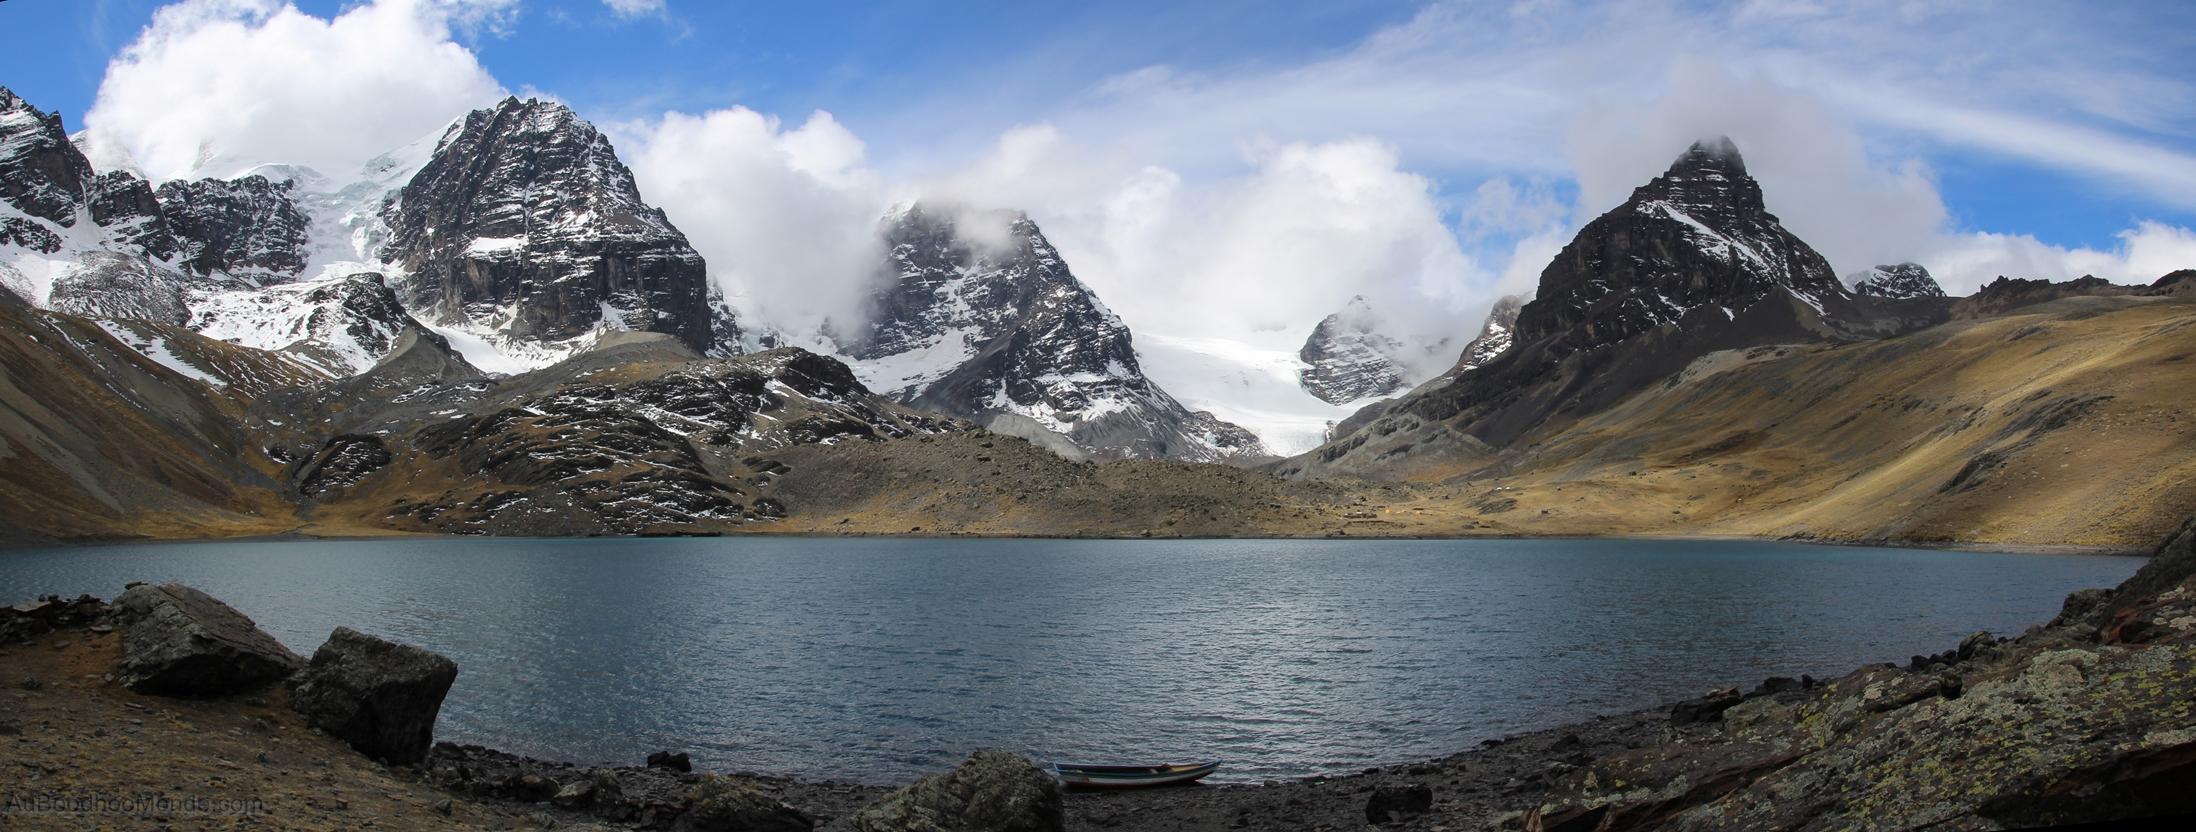 Bolivie - Trek Condoriri Huayna Potosi camping